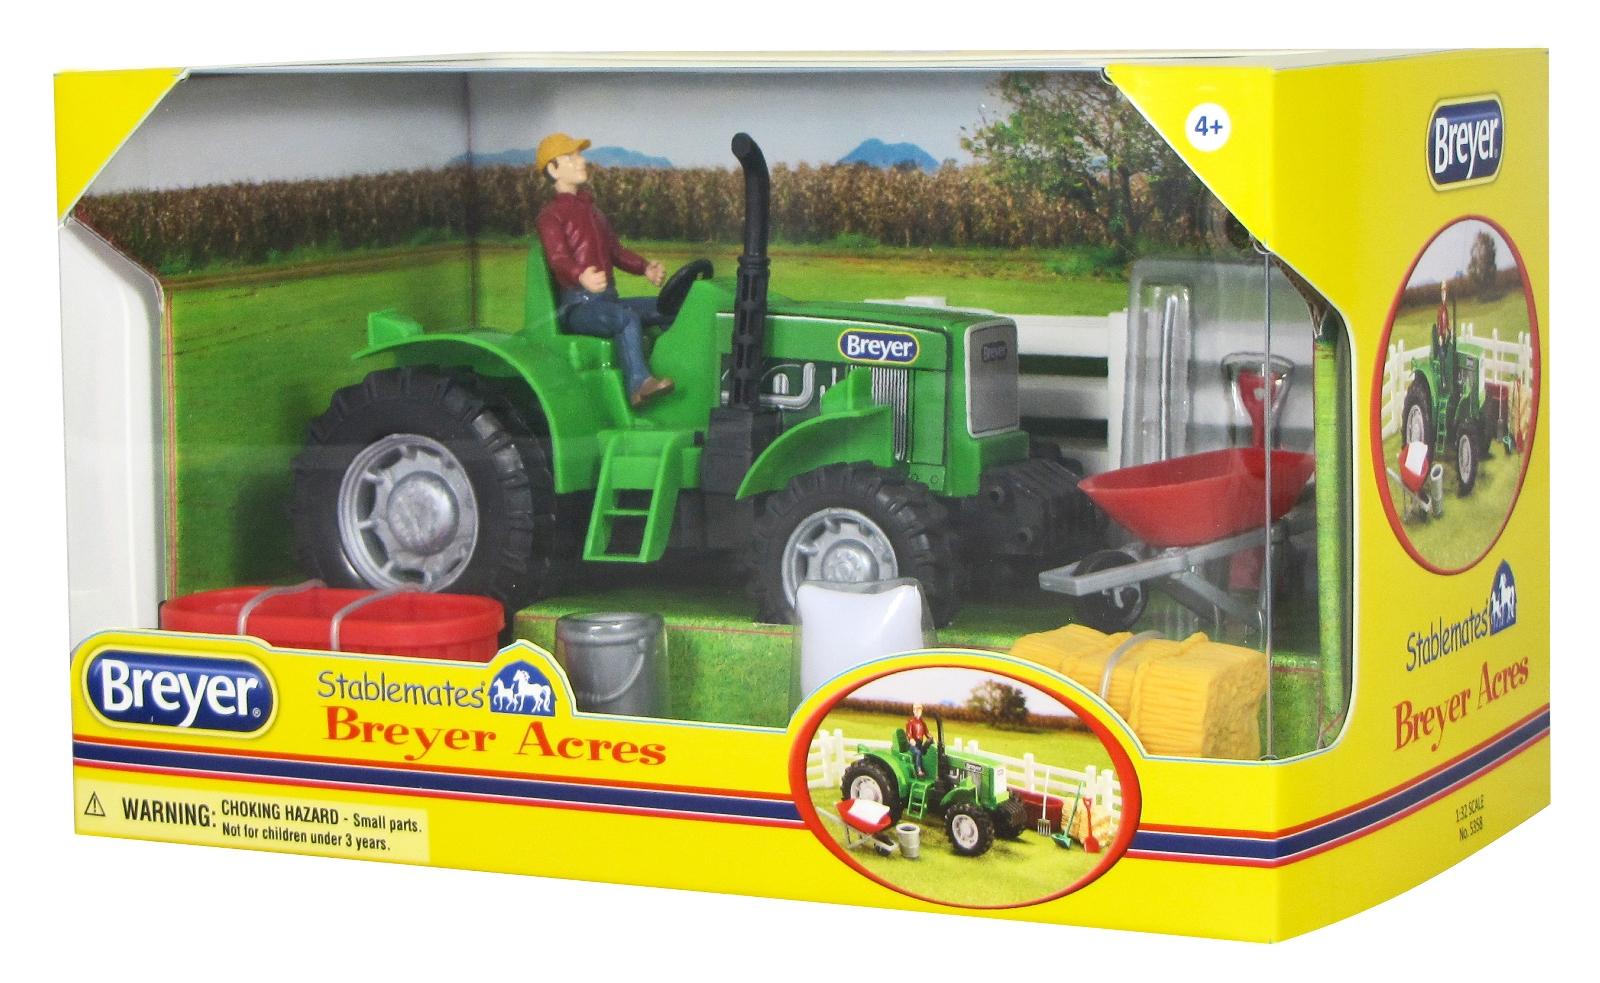 Breyer Stablemates Breyer Acres